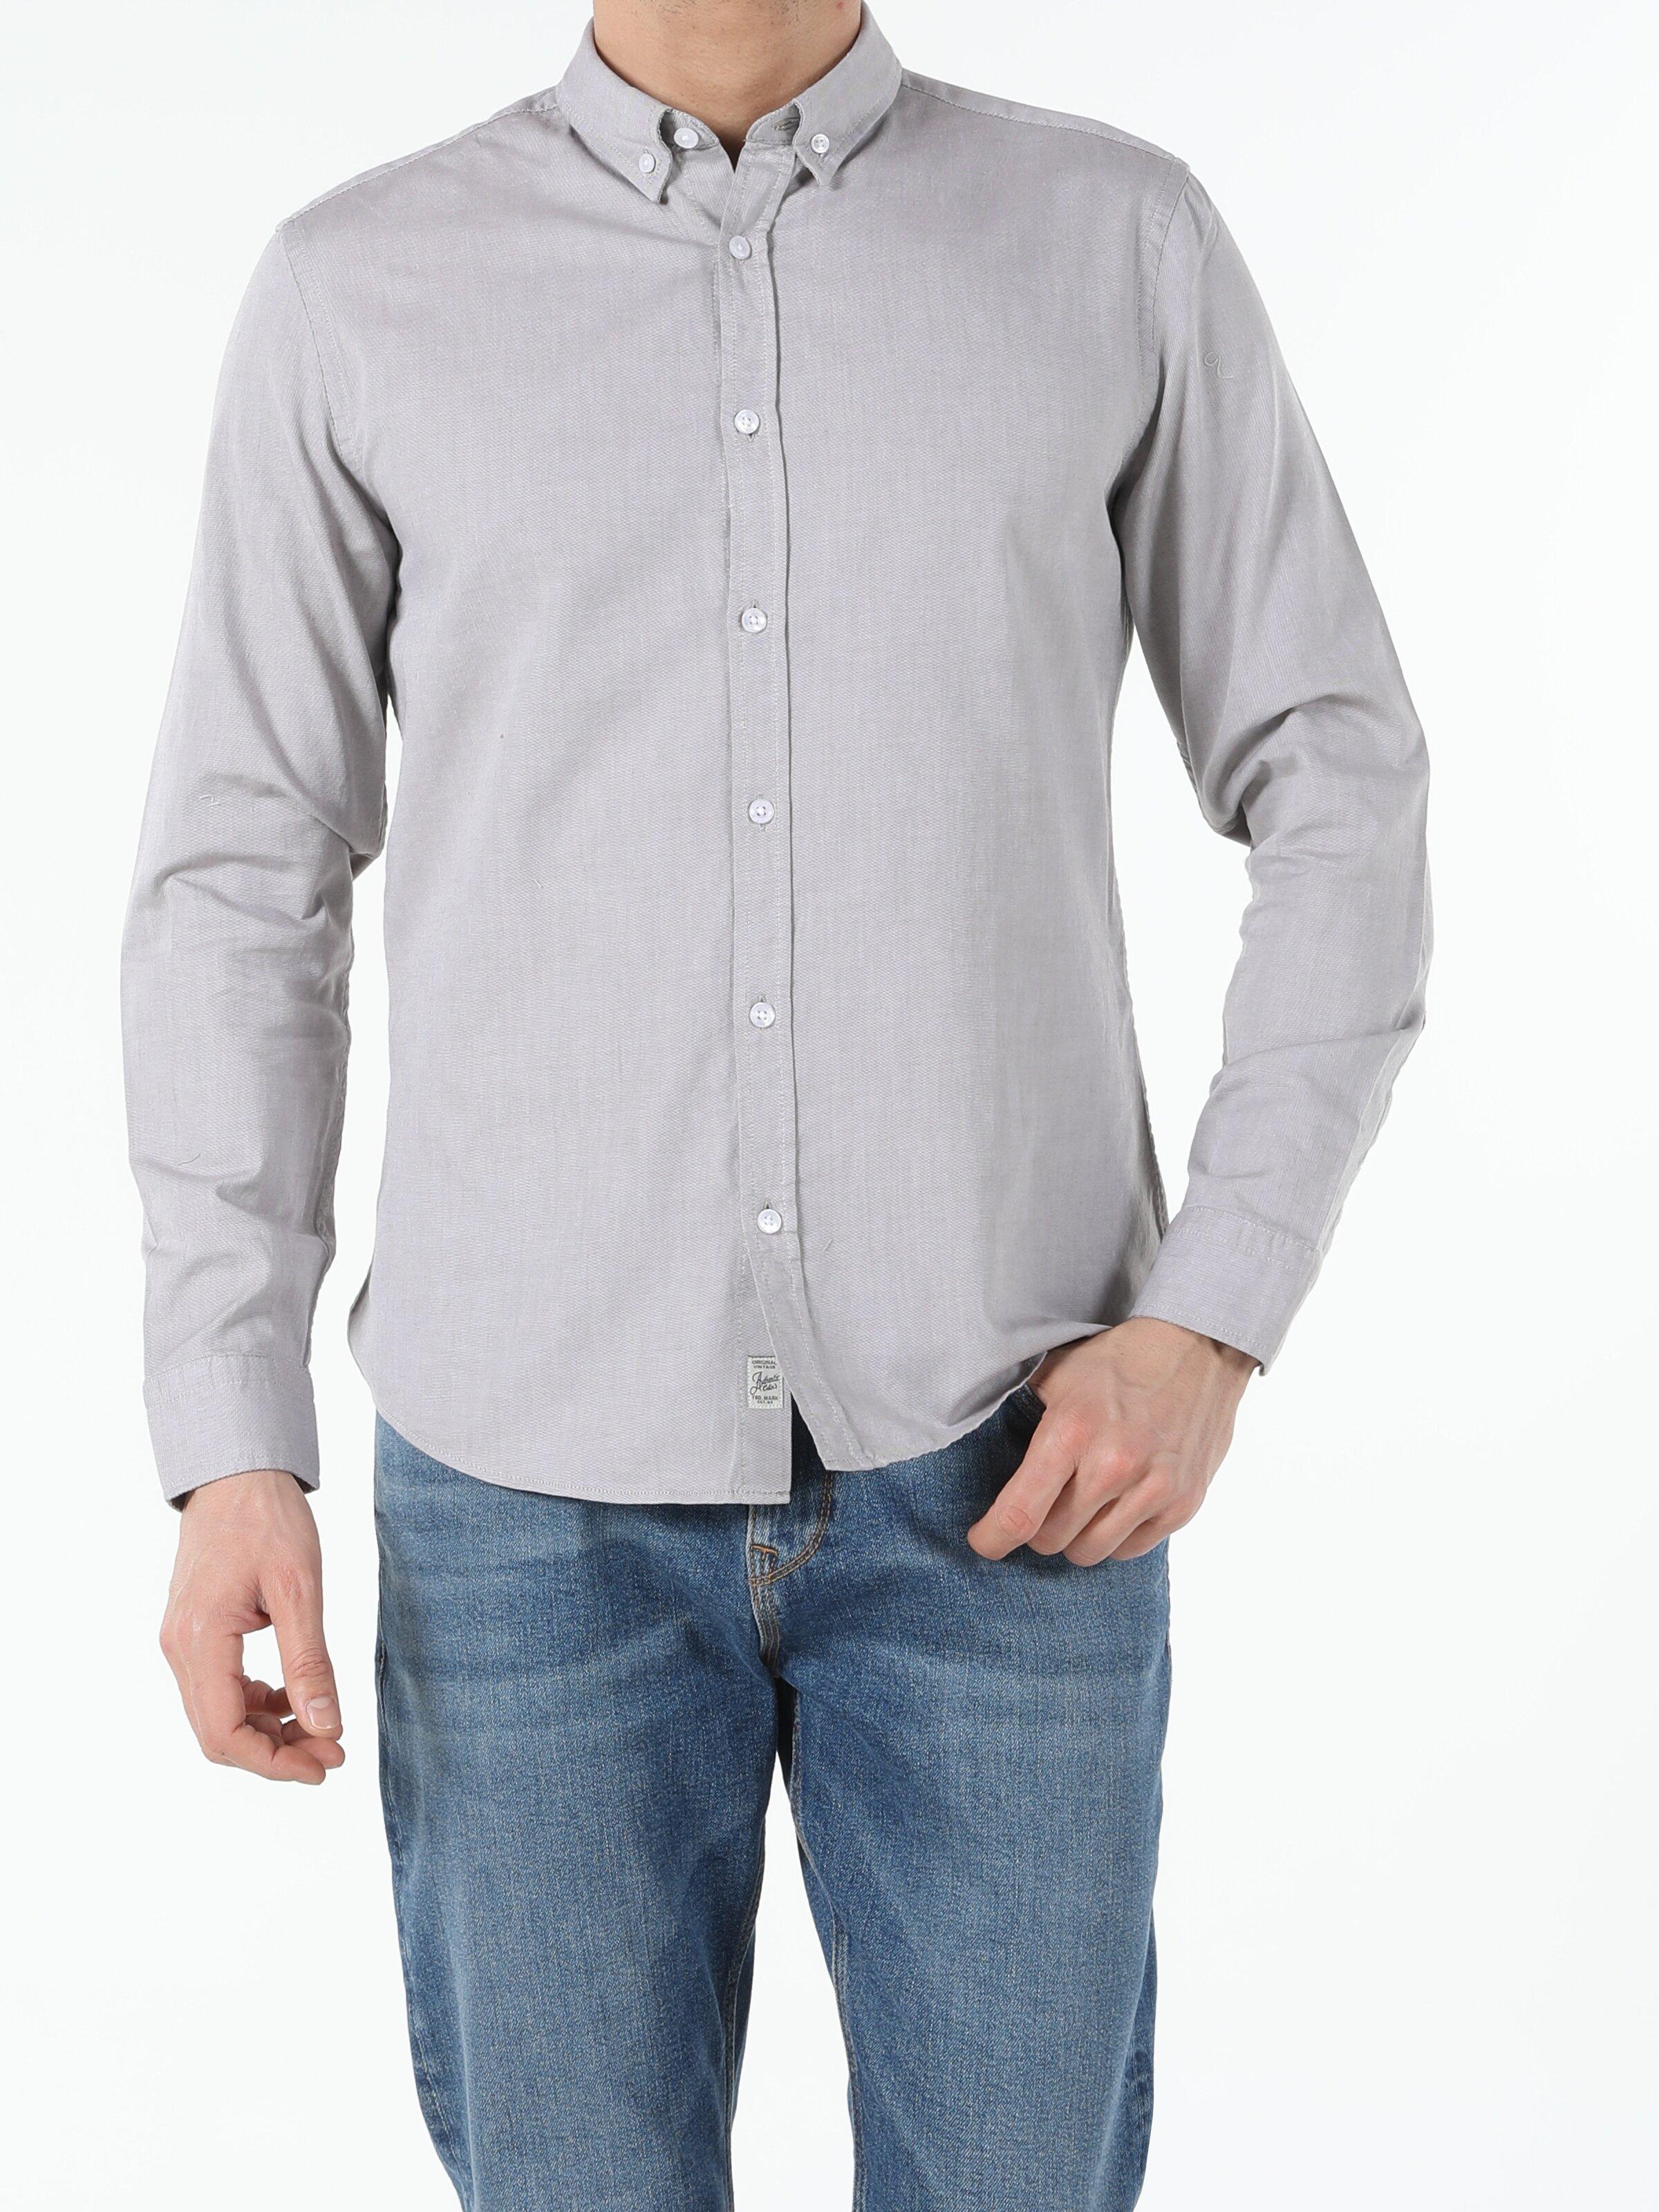 Slim Fit Shirt Neck Erkek Bej Uzun Kol Gömlek